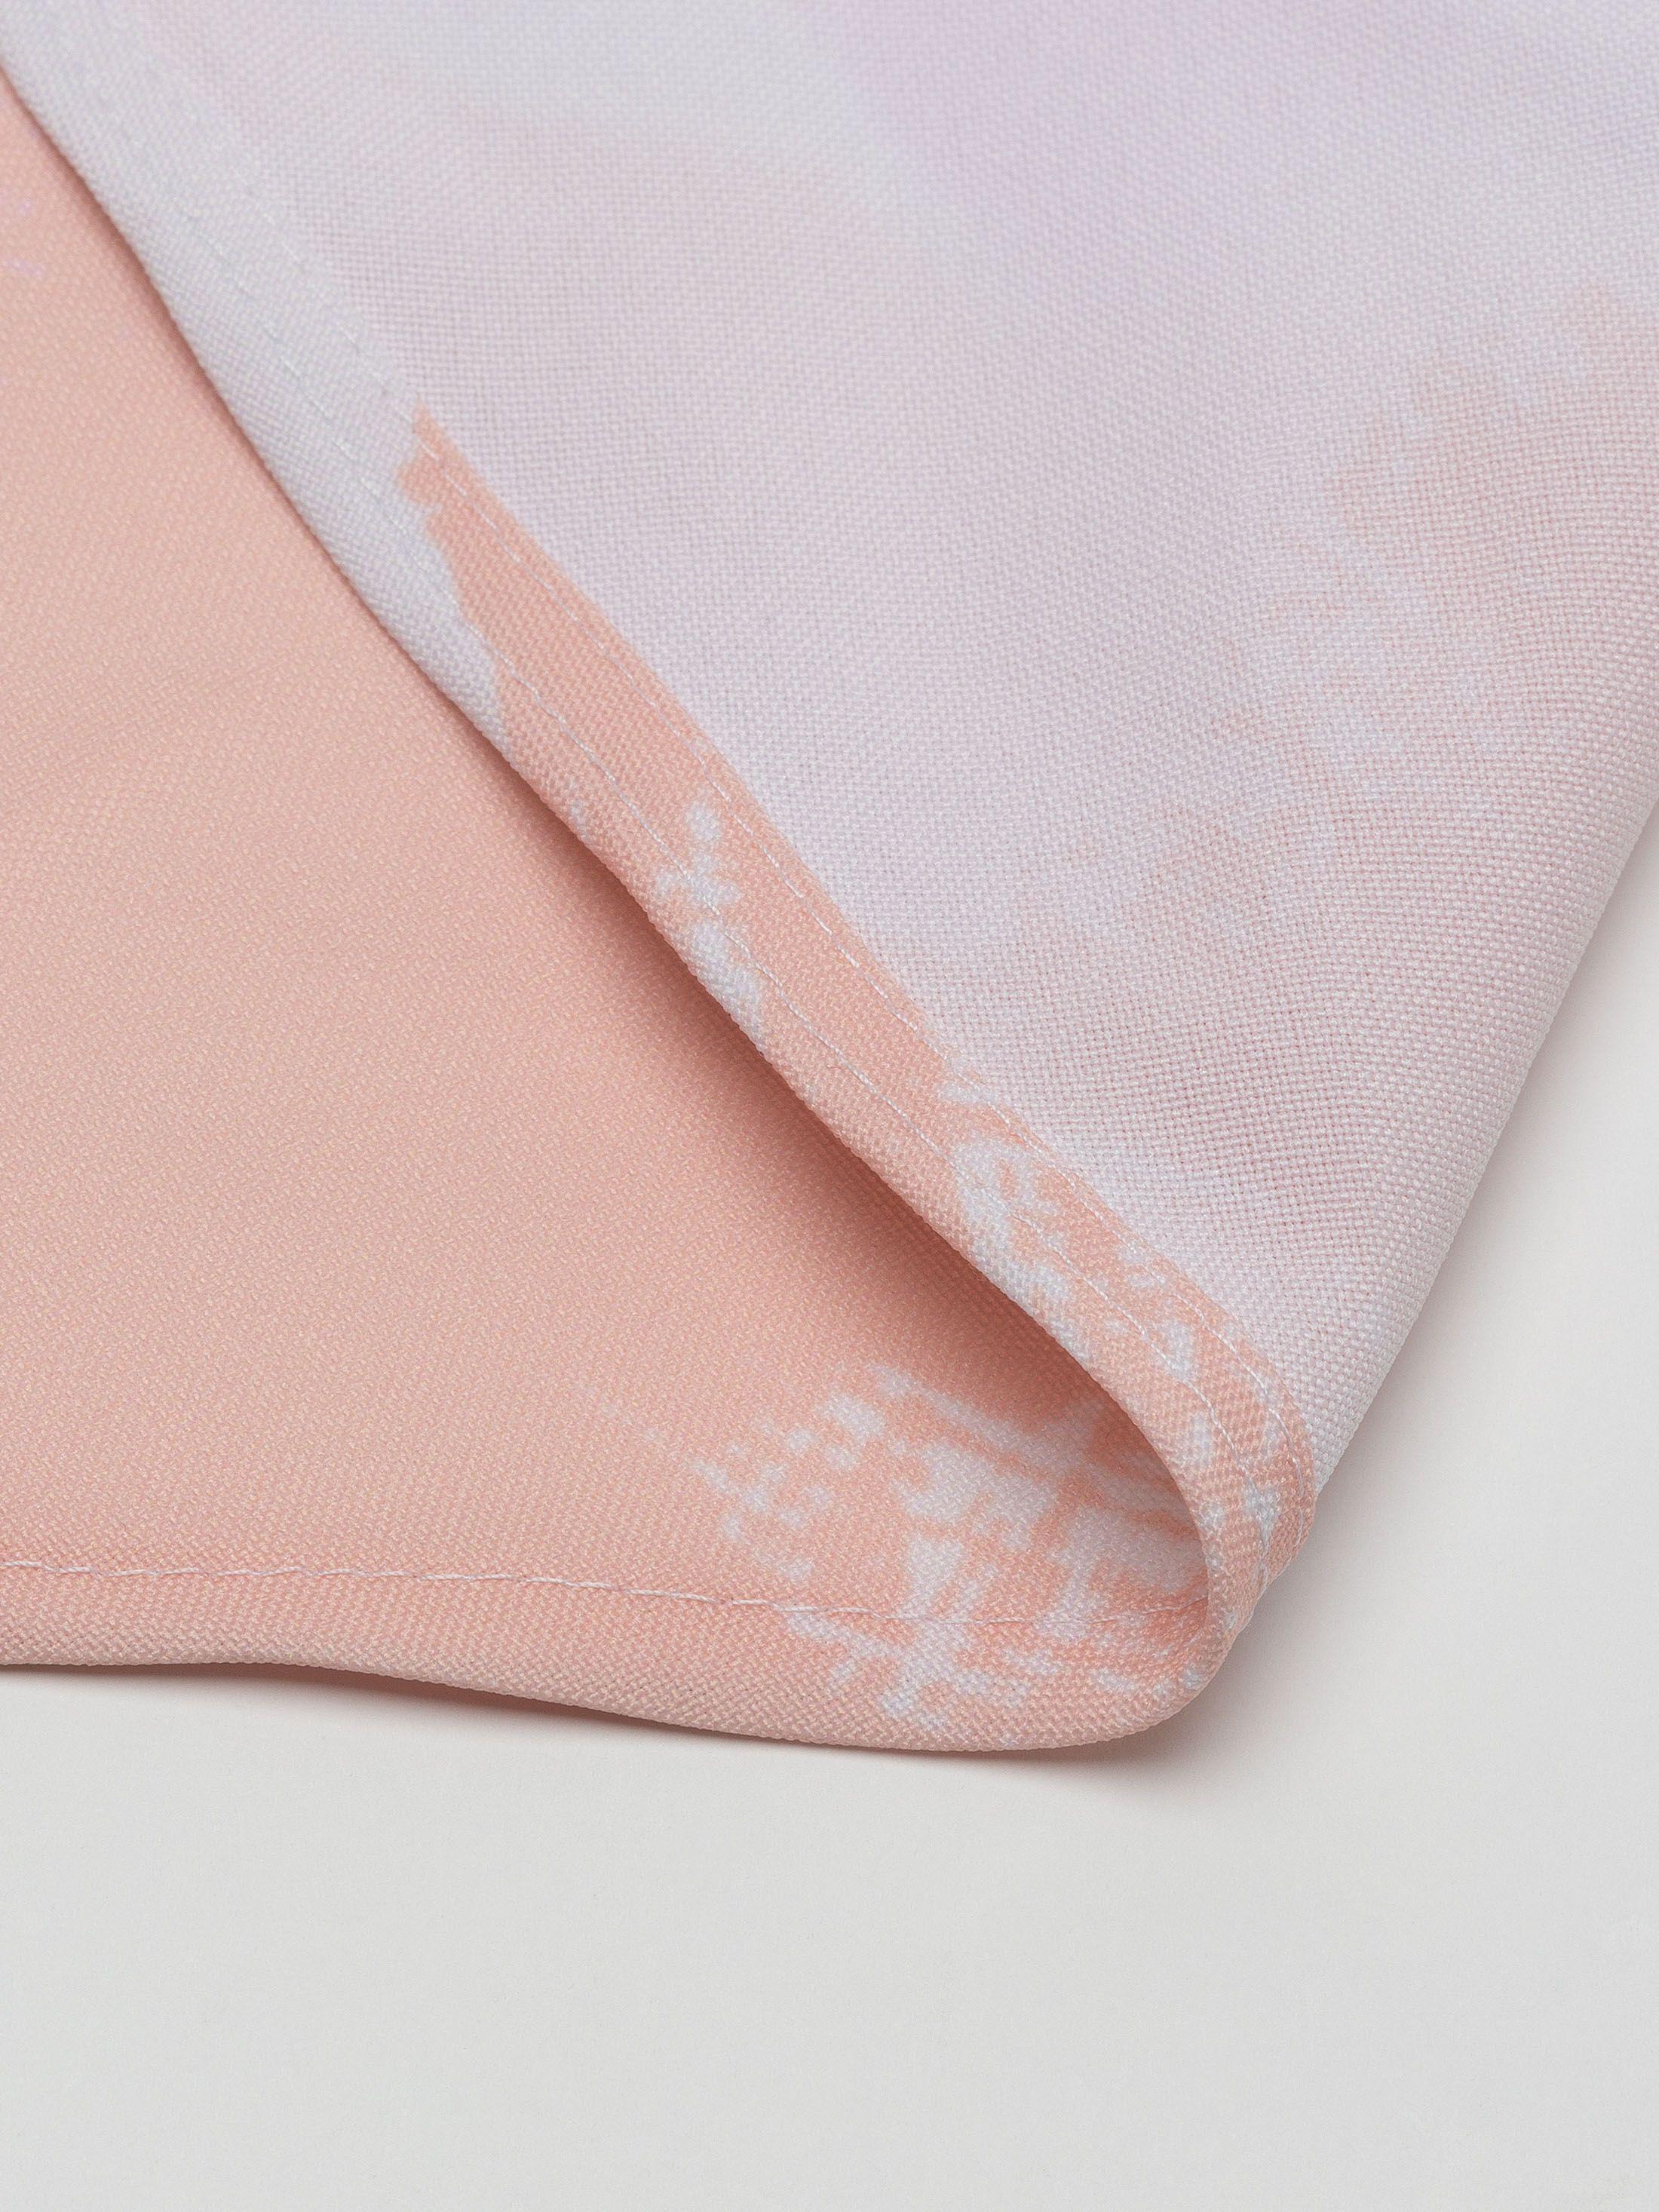 custom tablecloth detail